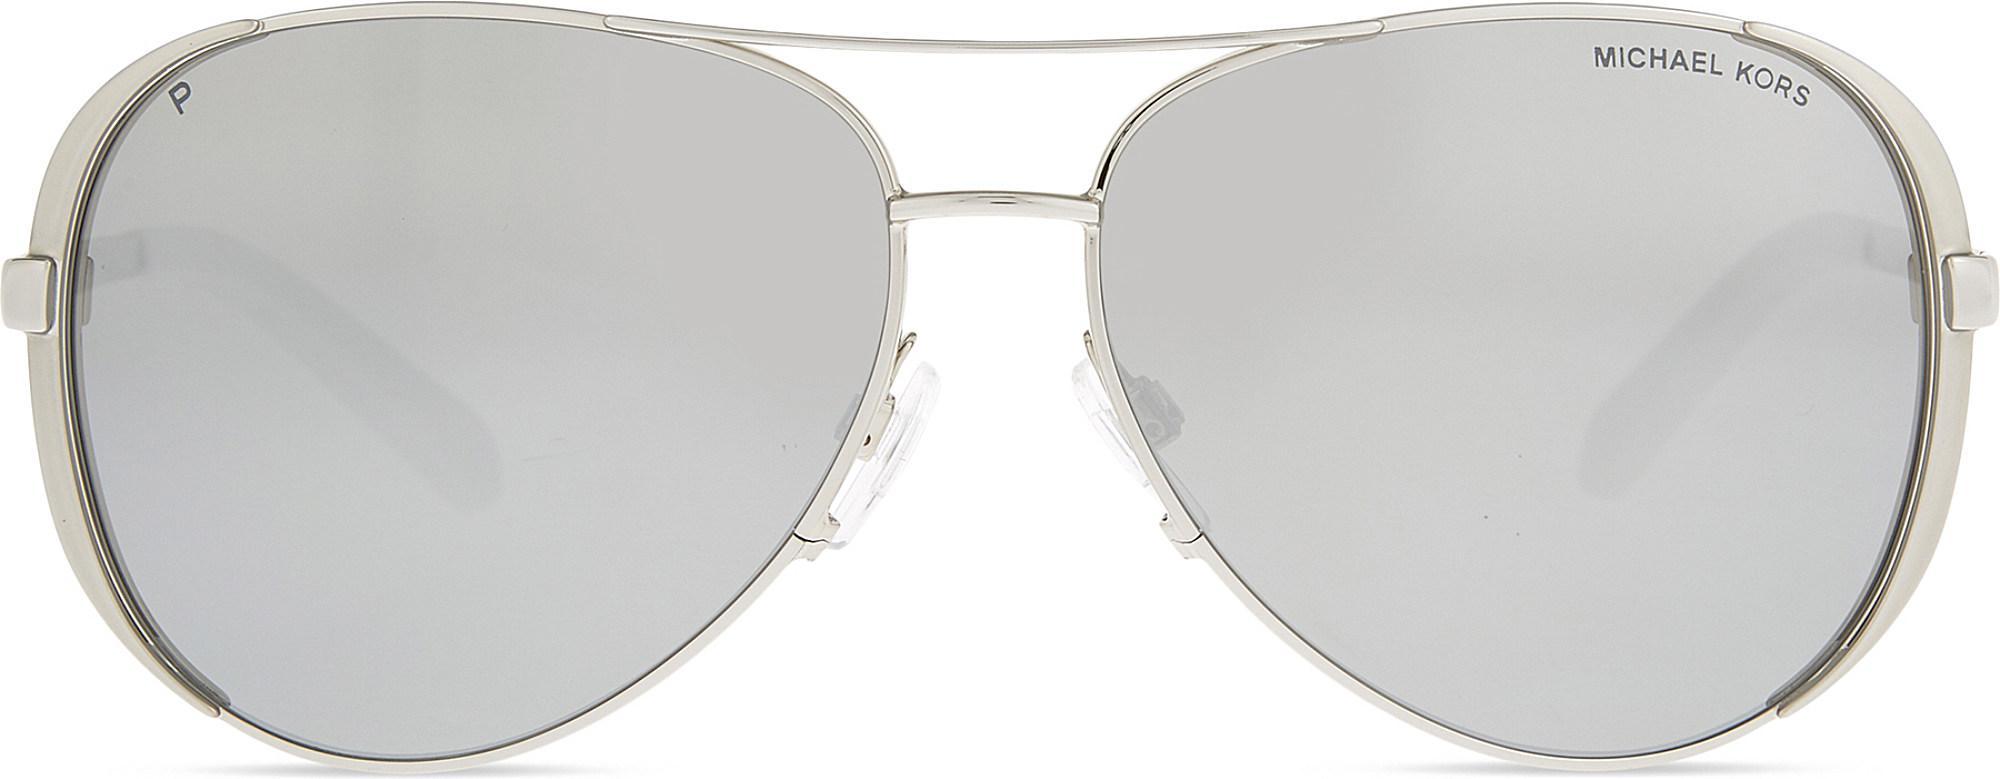 d110bedf06 Lyst - Michael Kors Mk5004 Chelsea Aviator Sunglasses in Metallic